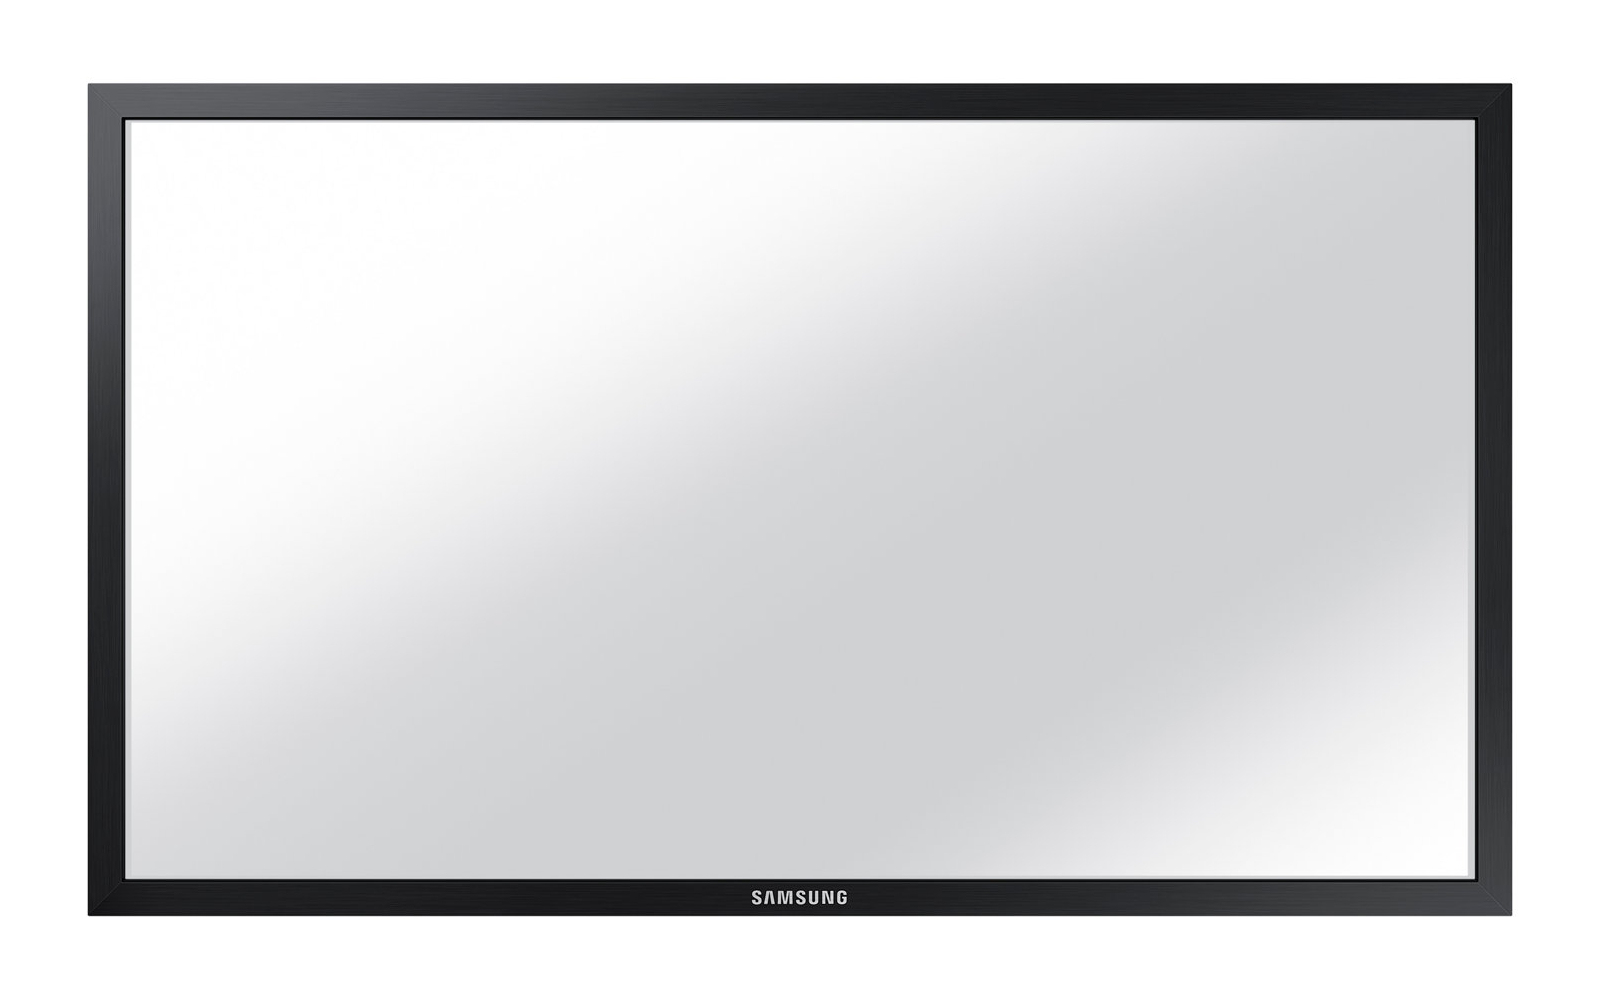 "Samsung CY-TD55LDAH protector para pantalla táctil 139,7 cm (55"") Multi-touch"